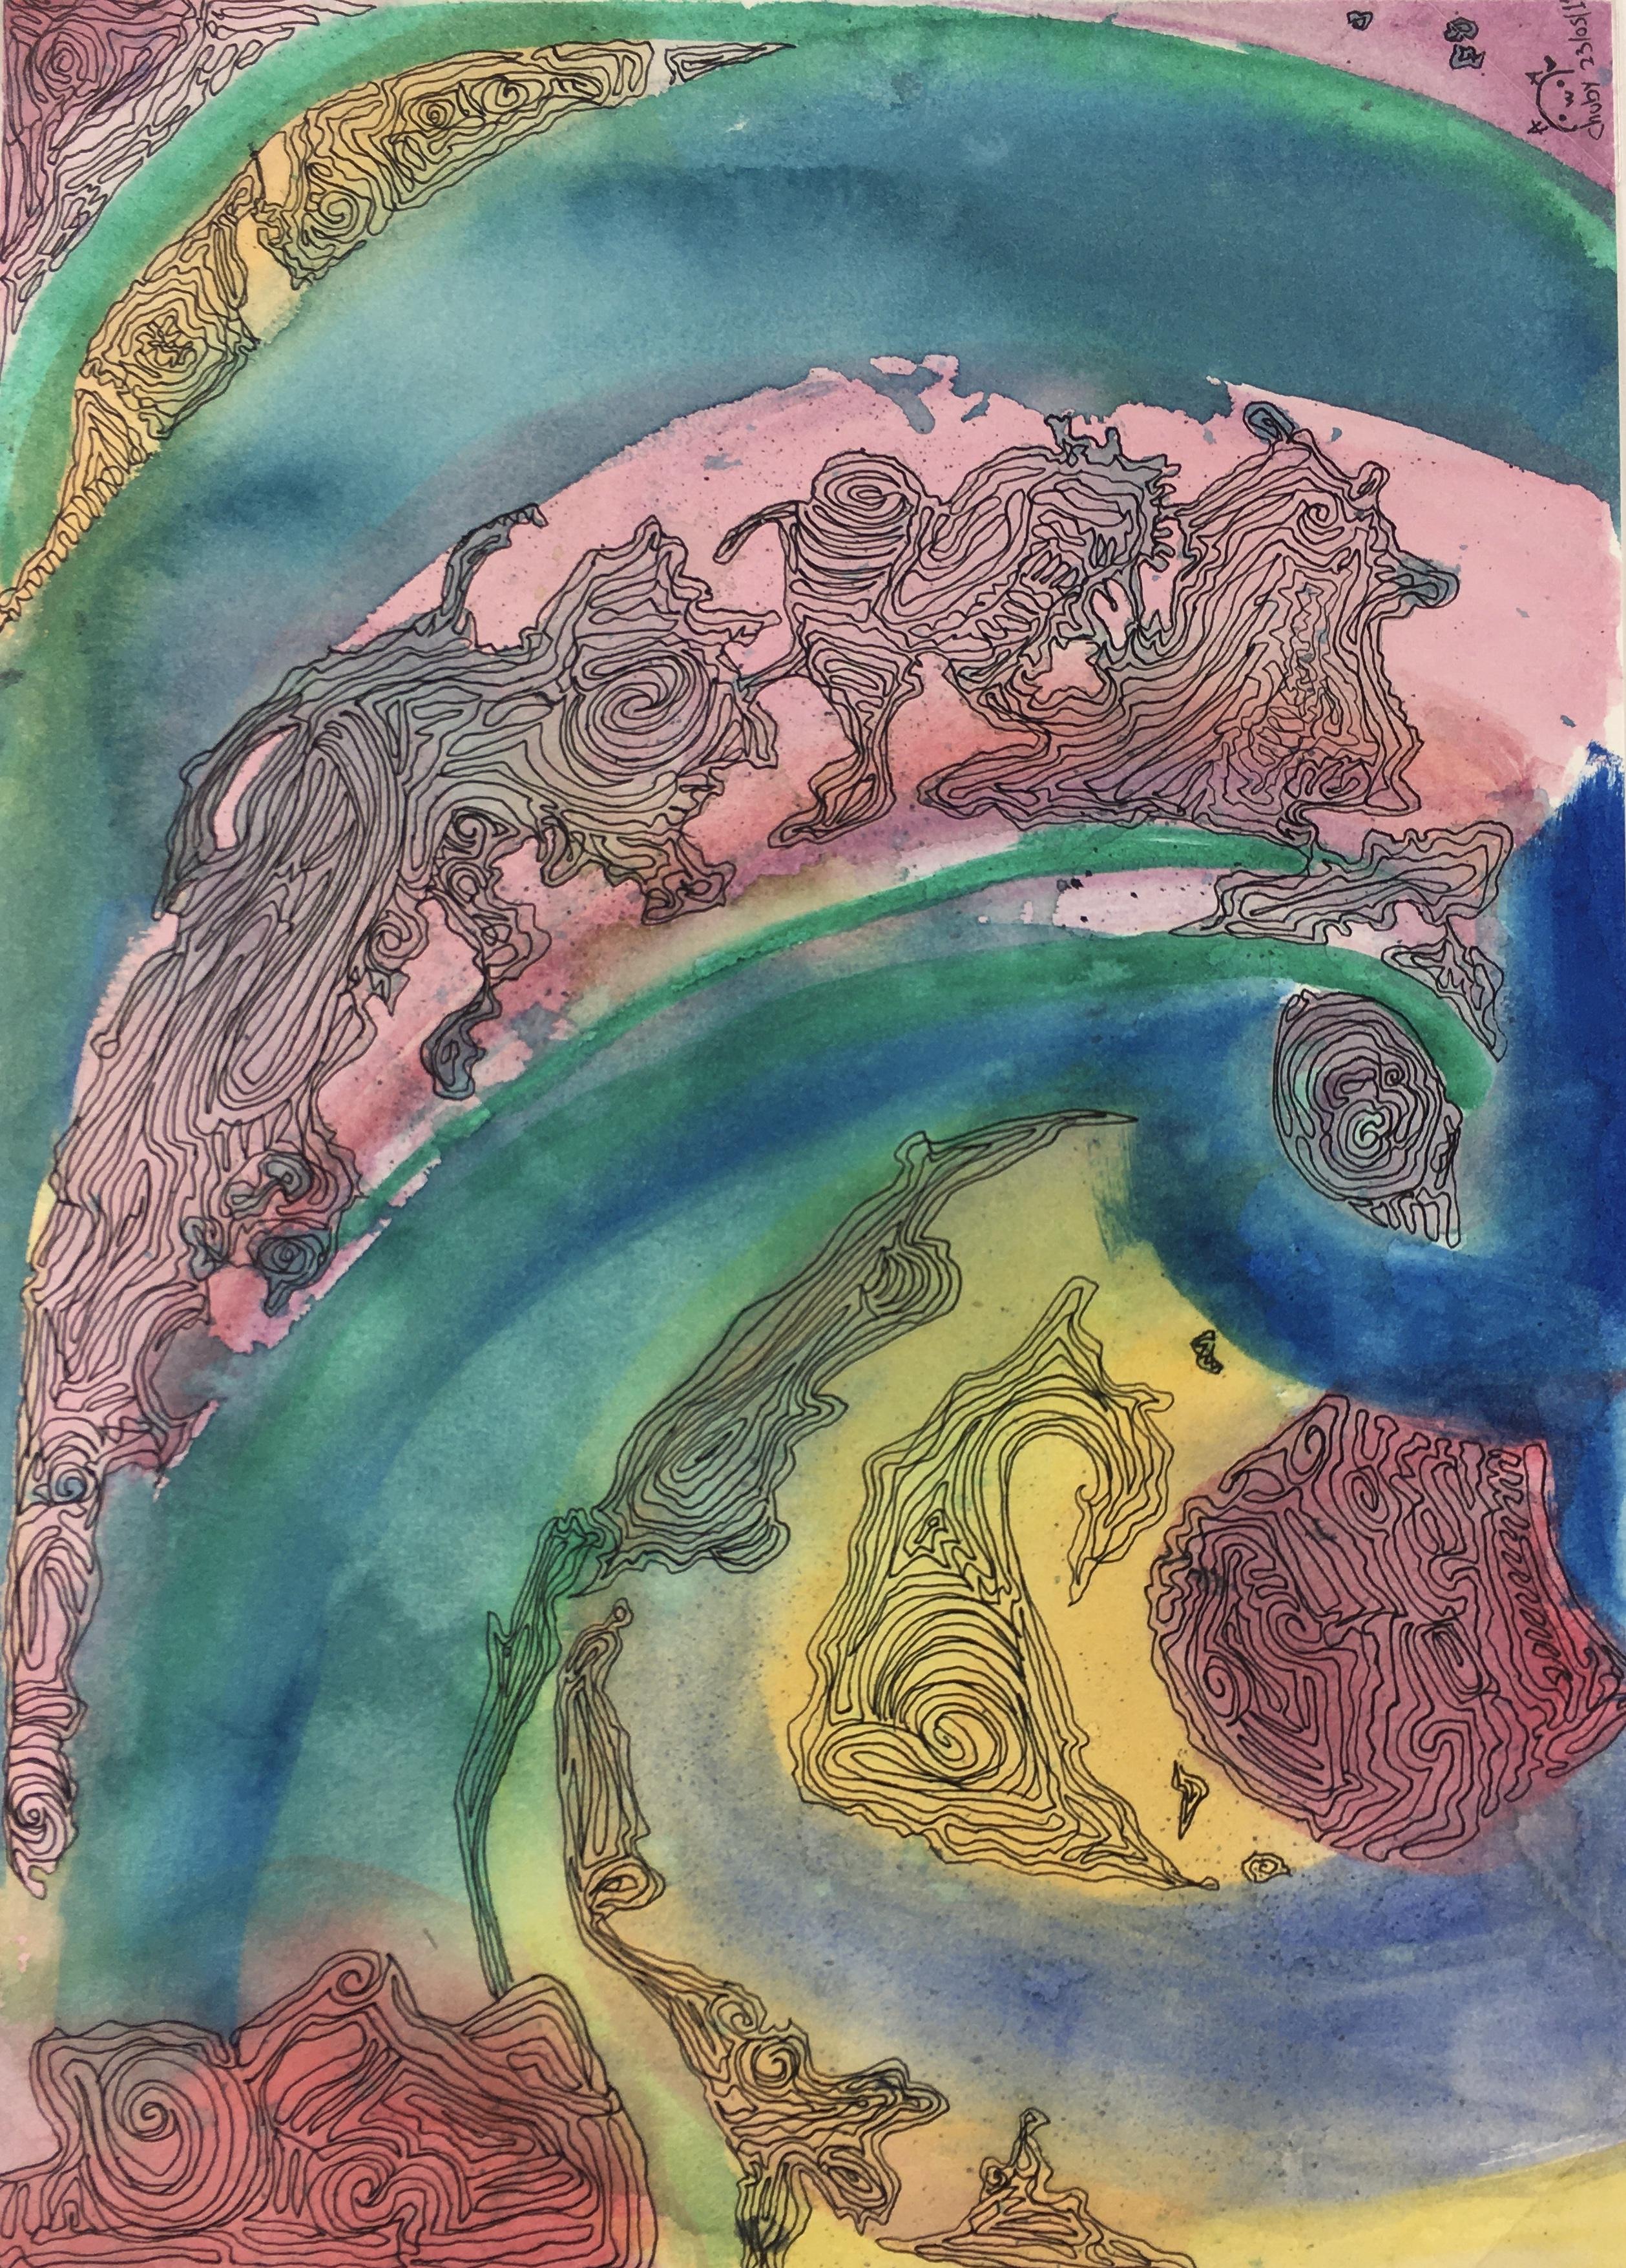 Surreal Modern Original Art - Suenos, Chuby, 2012